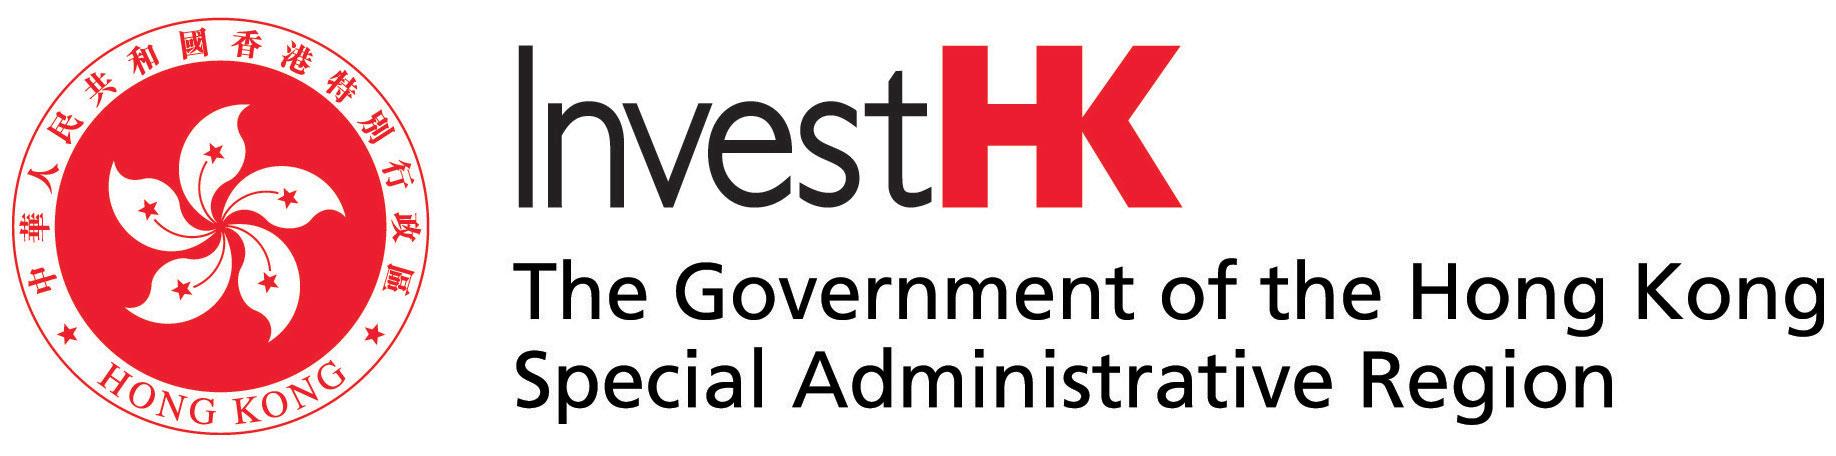 ihk-logo-from-2010